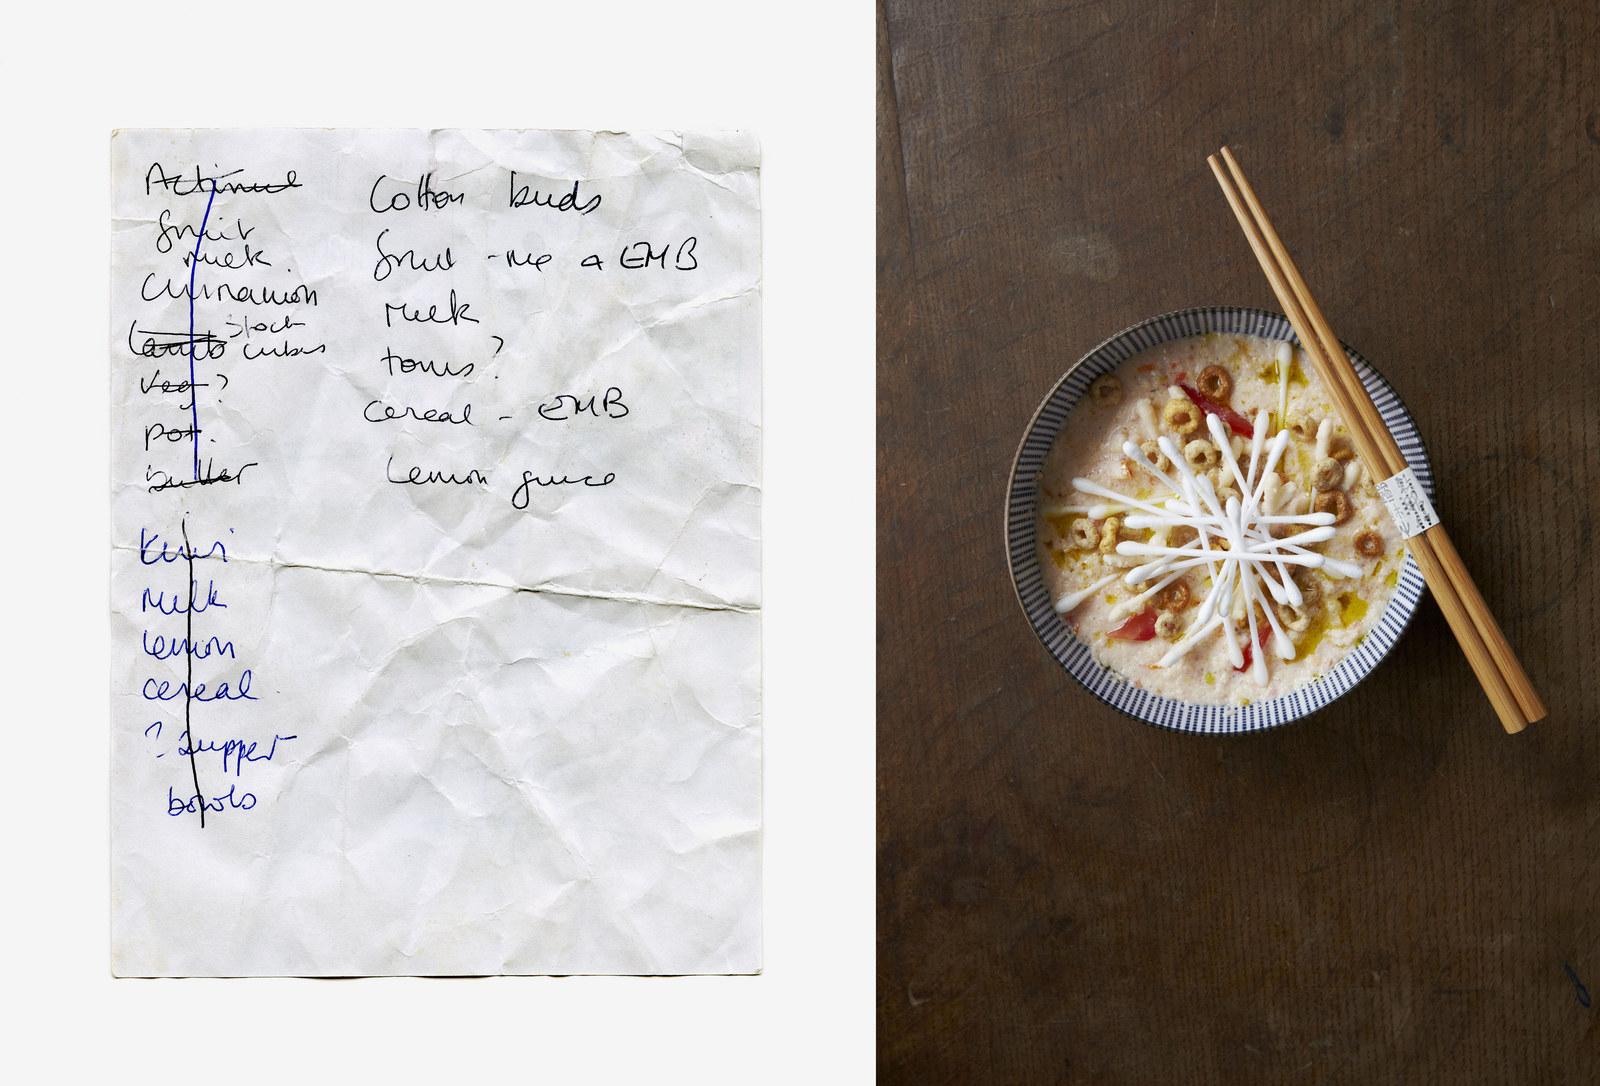 thomas_lakeman_shopping_list_cookbook_05